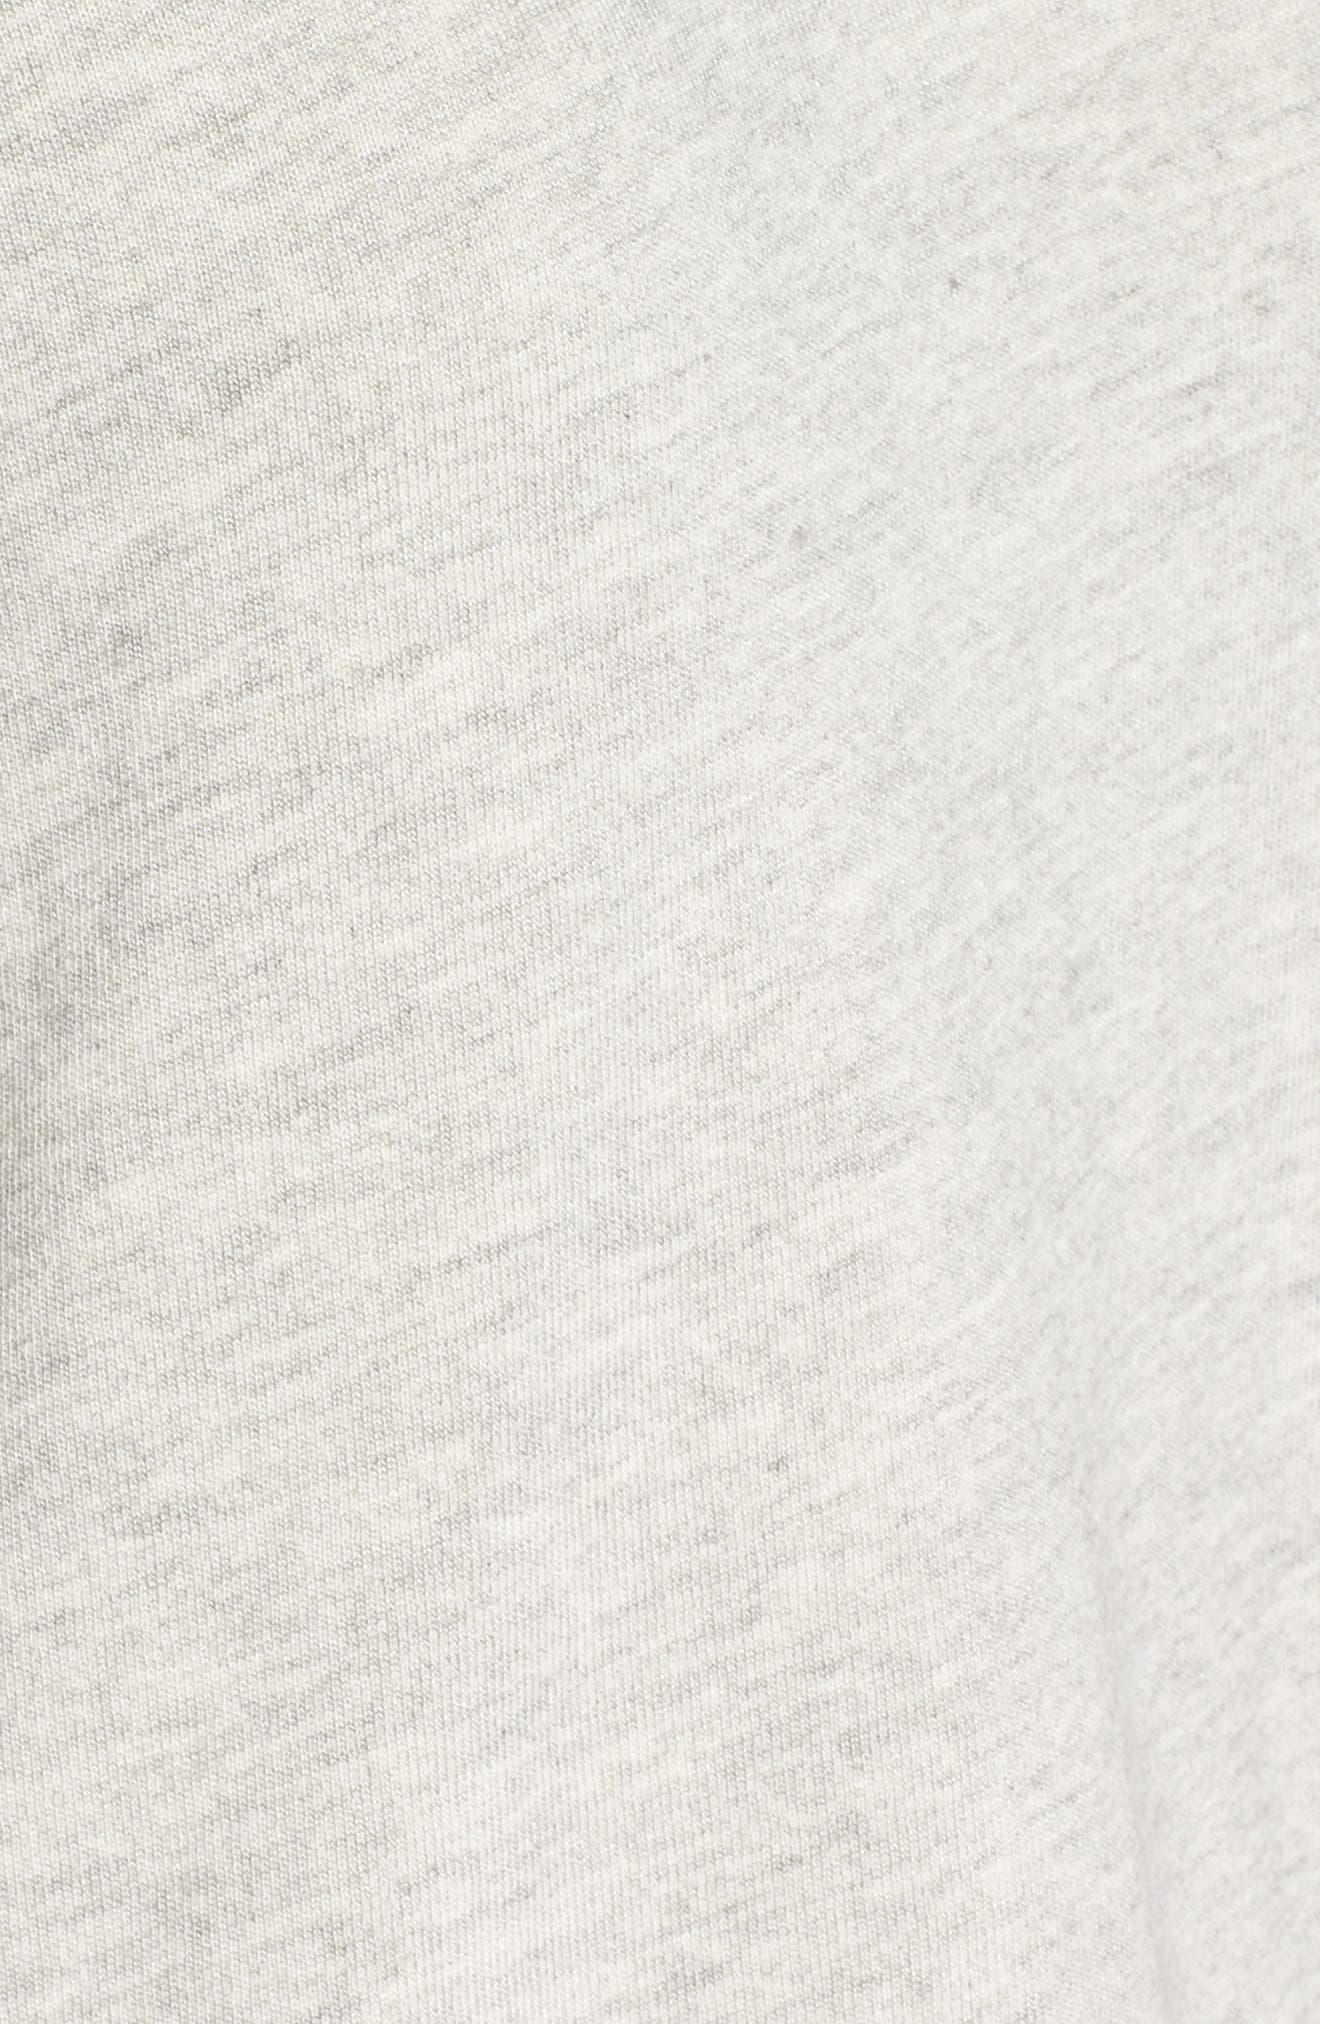 Savannah Cutout Sweatshirt,                             Alternate thumbnail 5, color,                             030